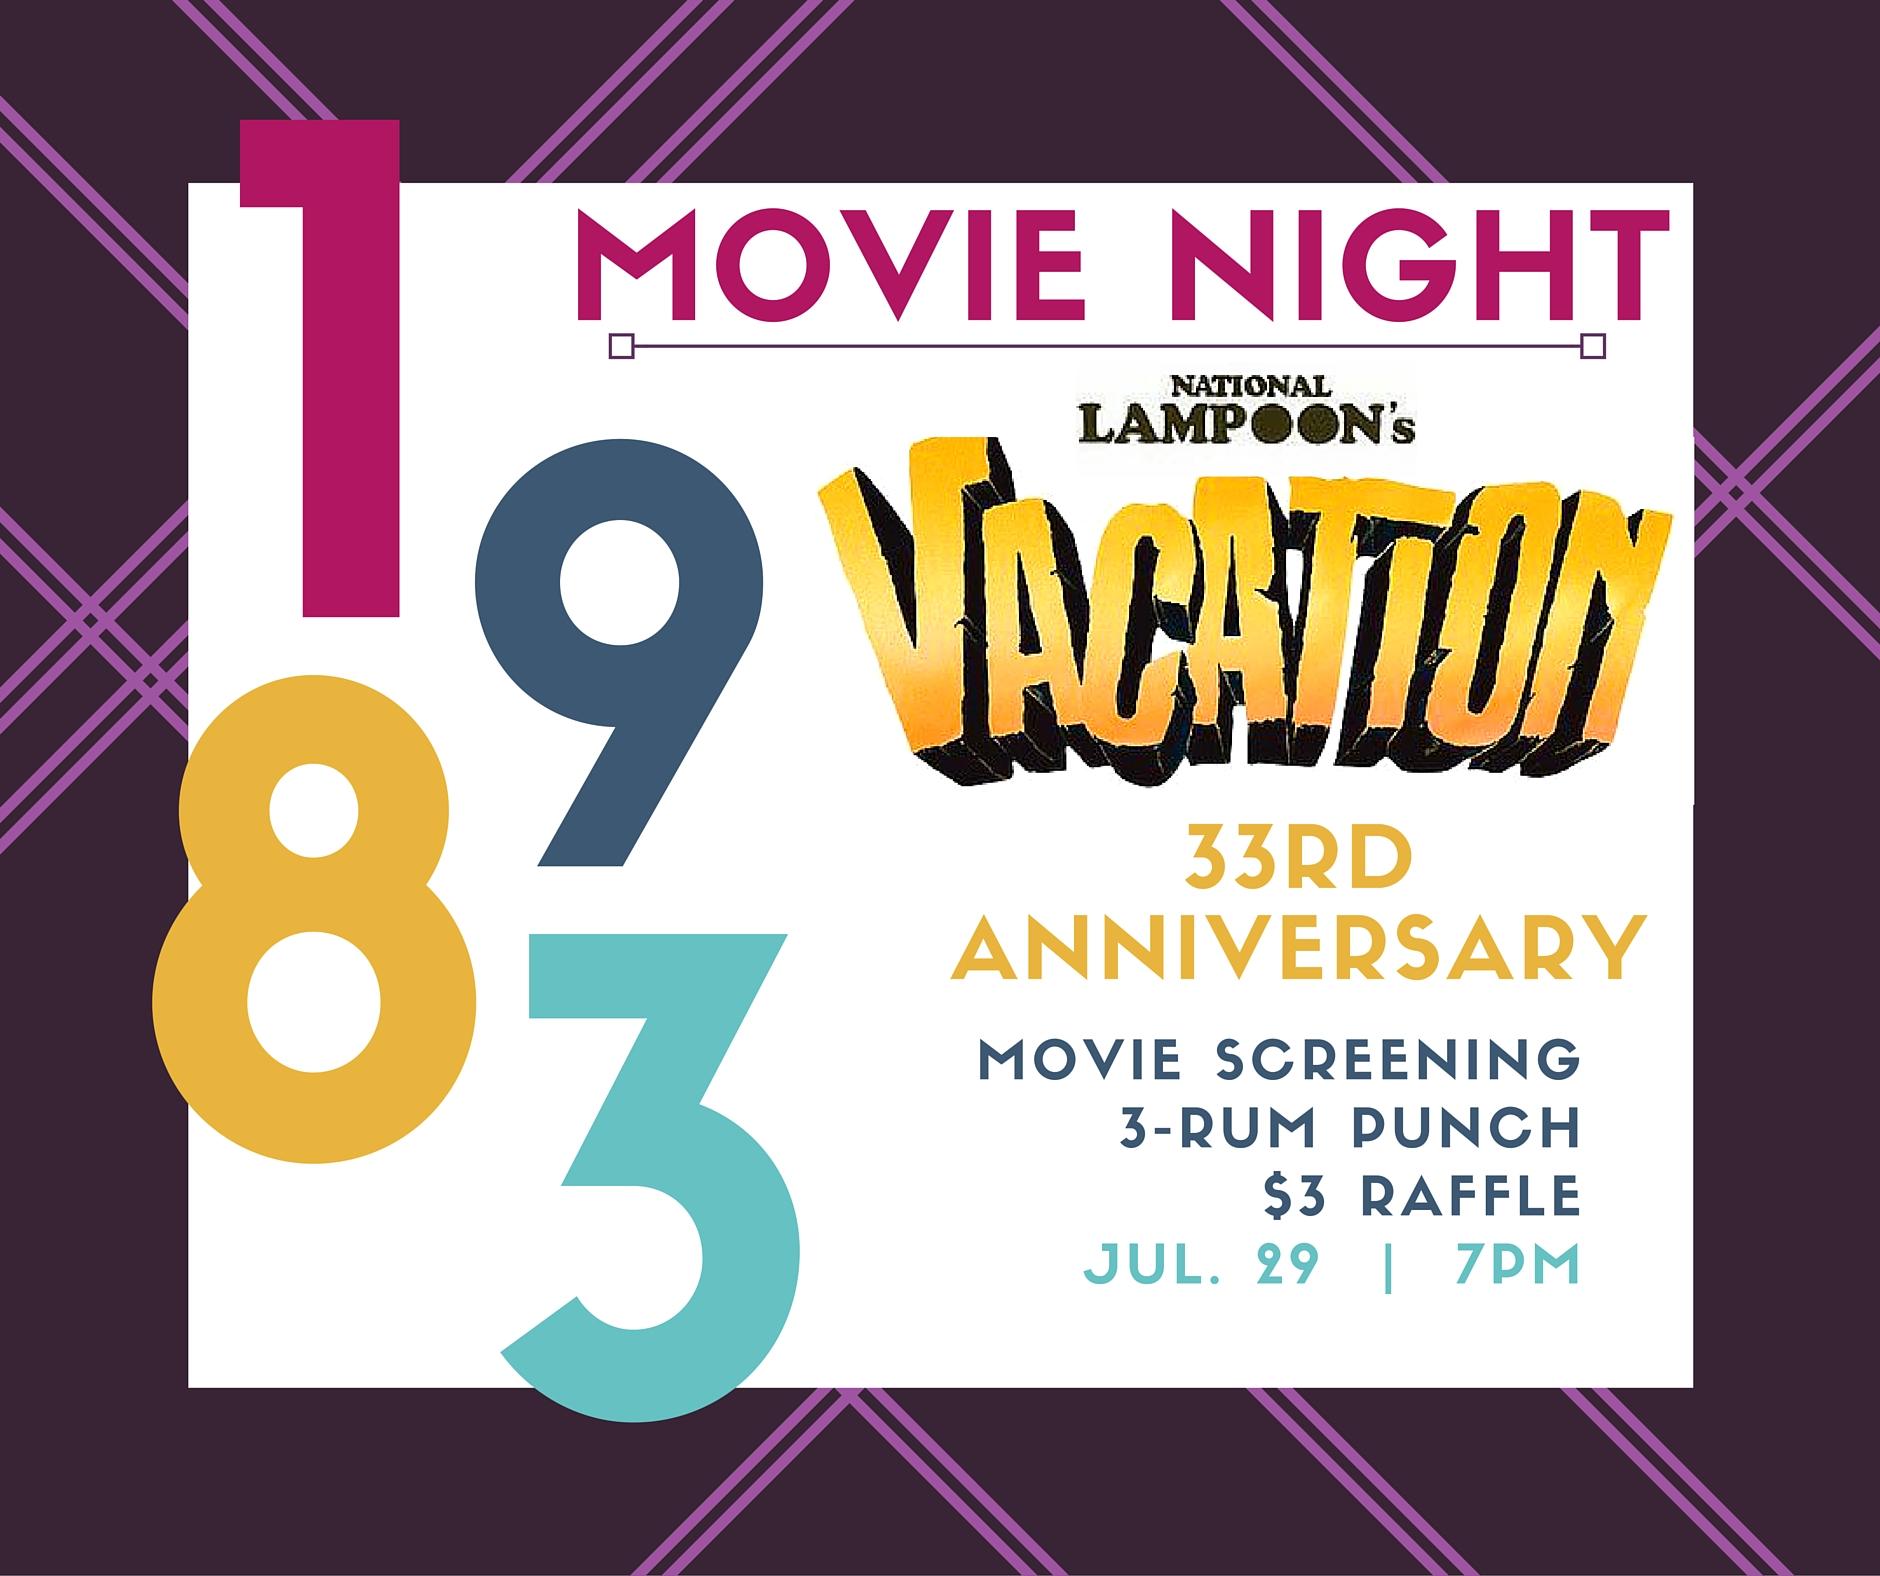 Movie Night 33rd Anniversary hi res.jpg